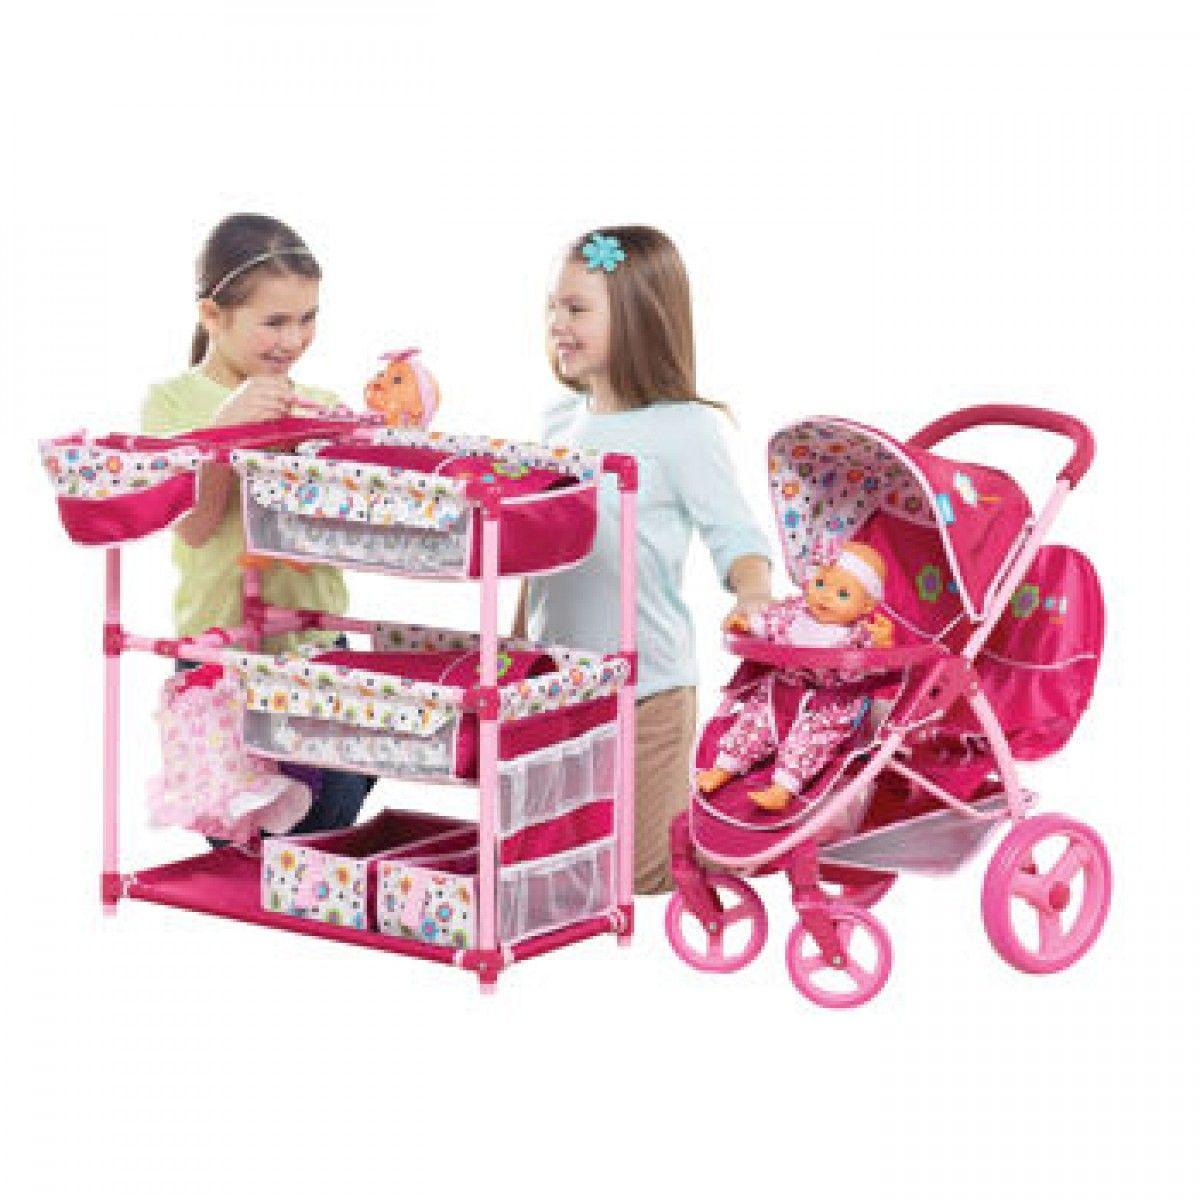 Malibu Doll Stroller & Activity Center Playset 34.99